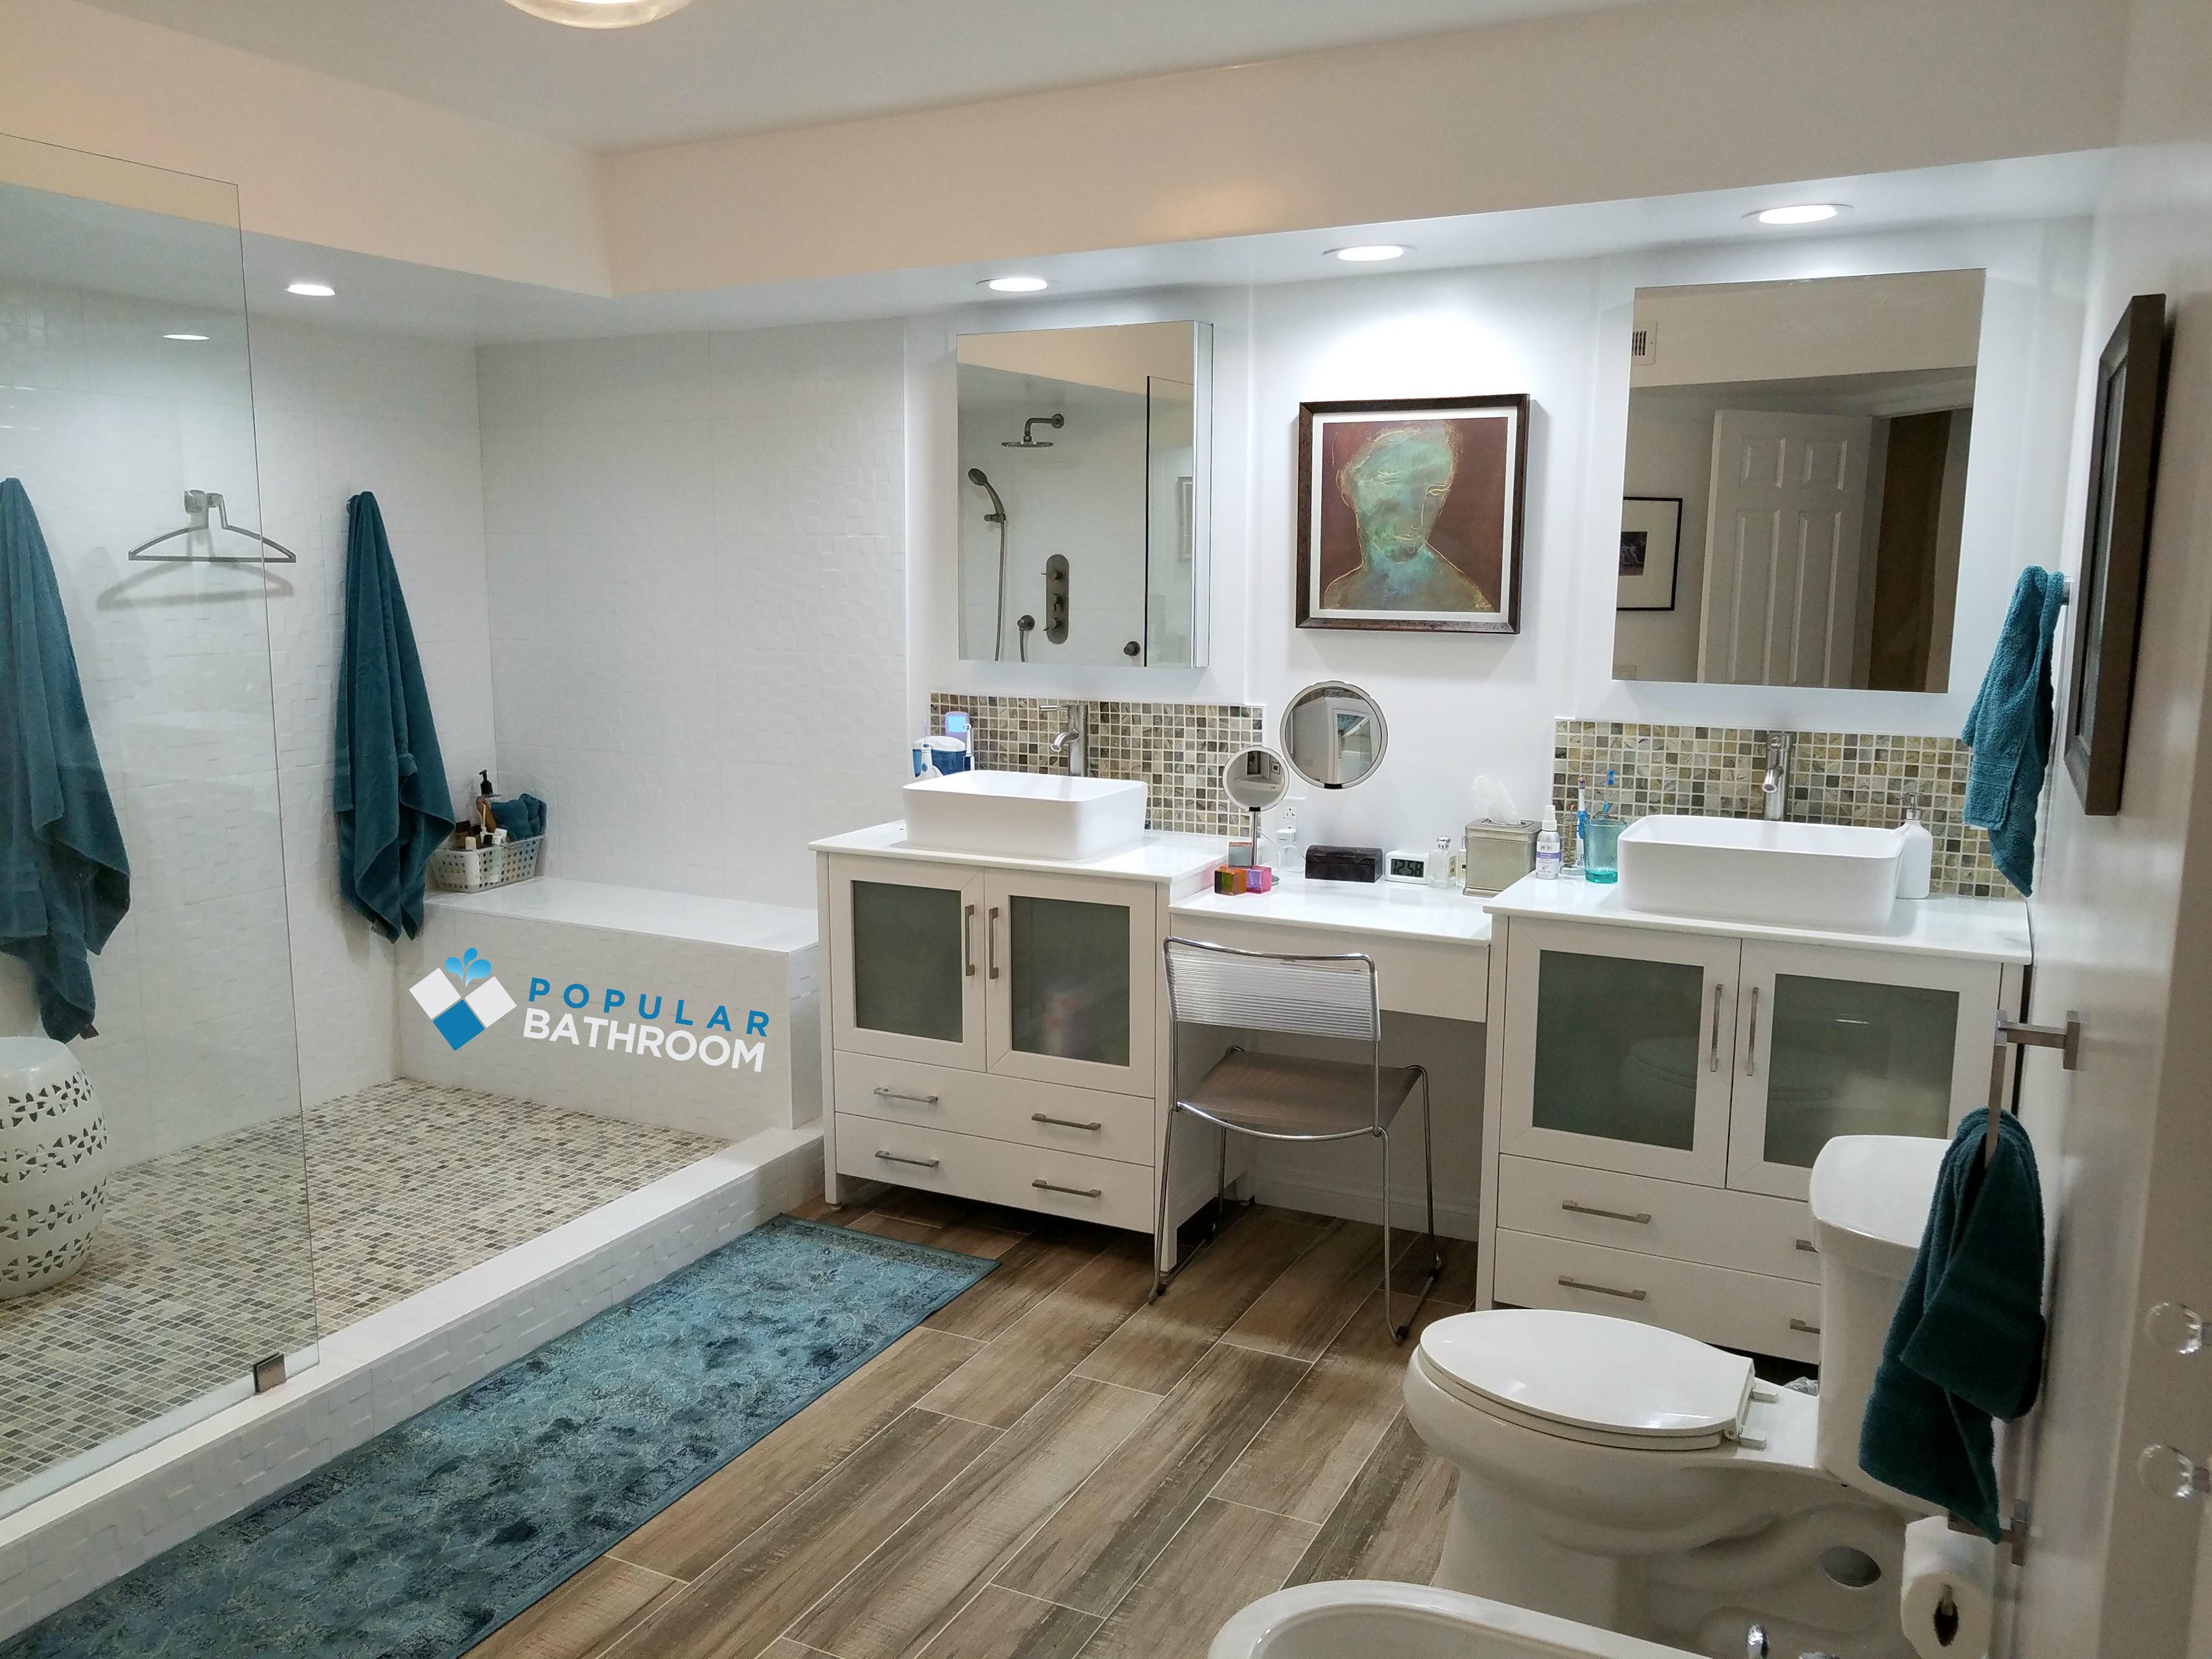 Popular Bathroom image 43